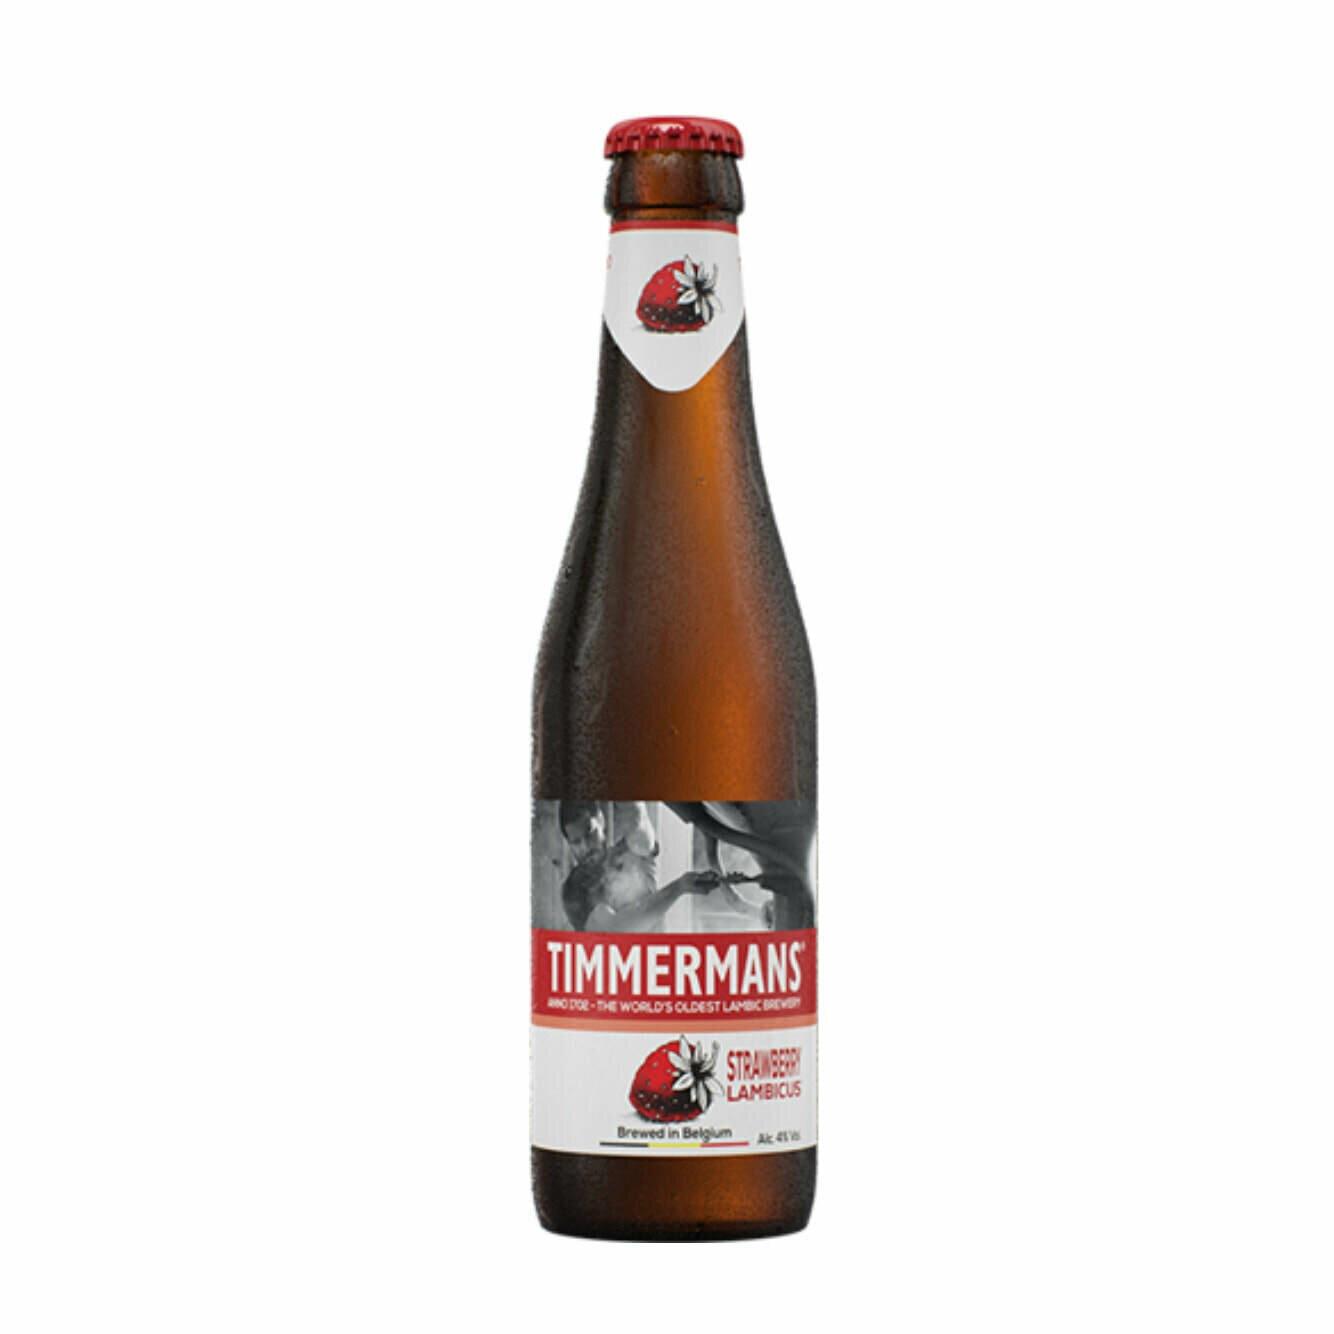 Timmermans Strawberry Lambic Bottle